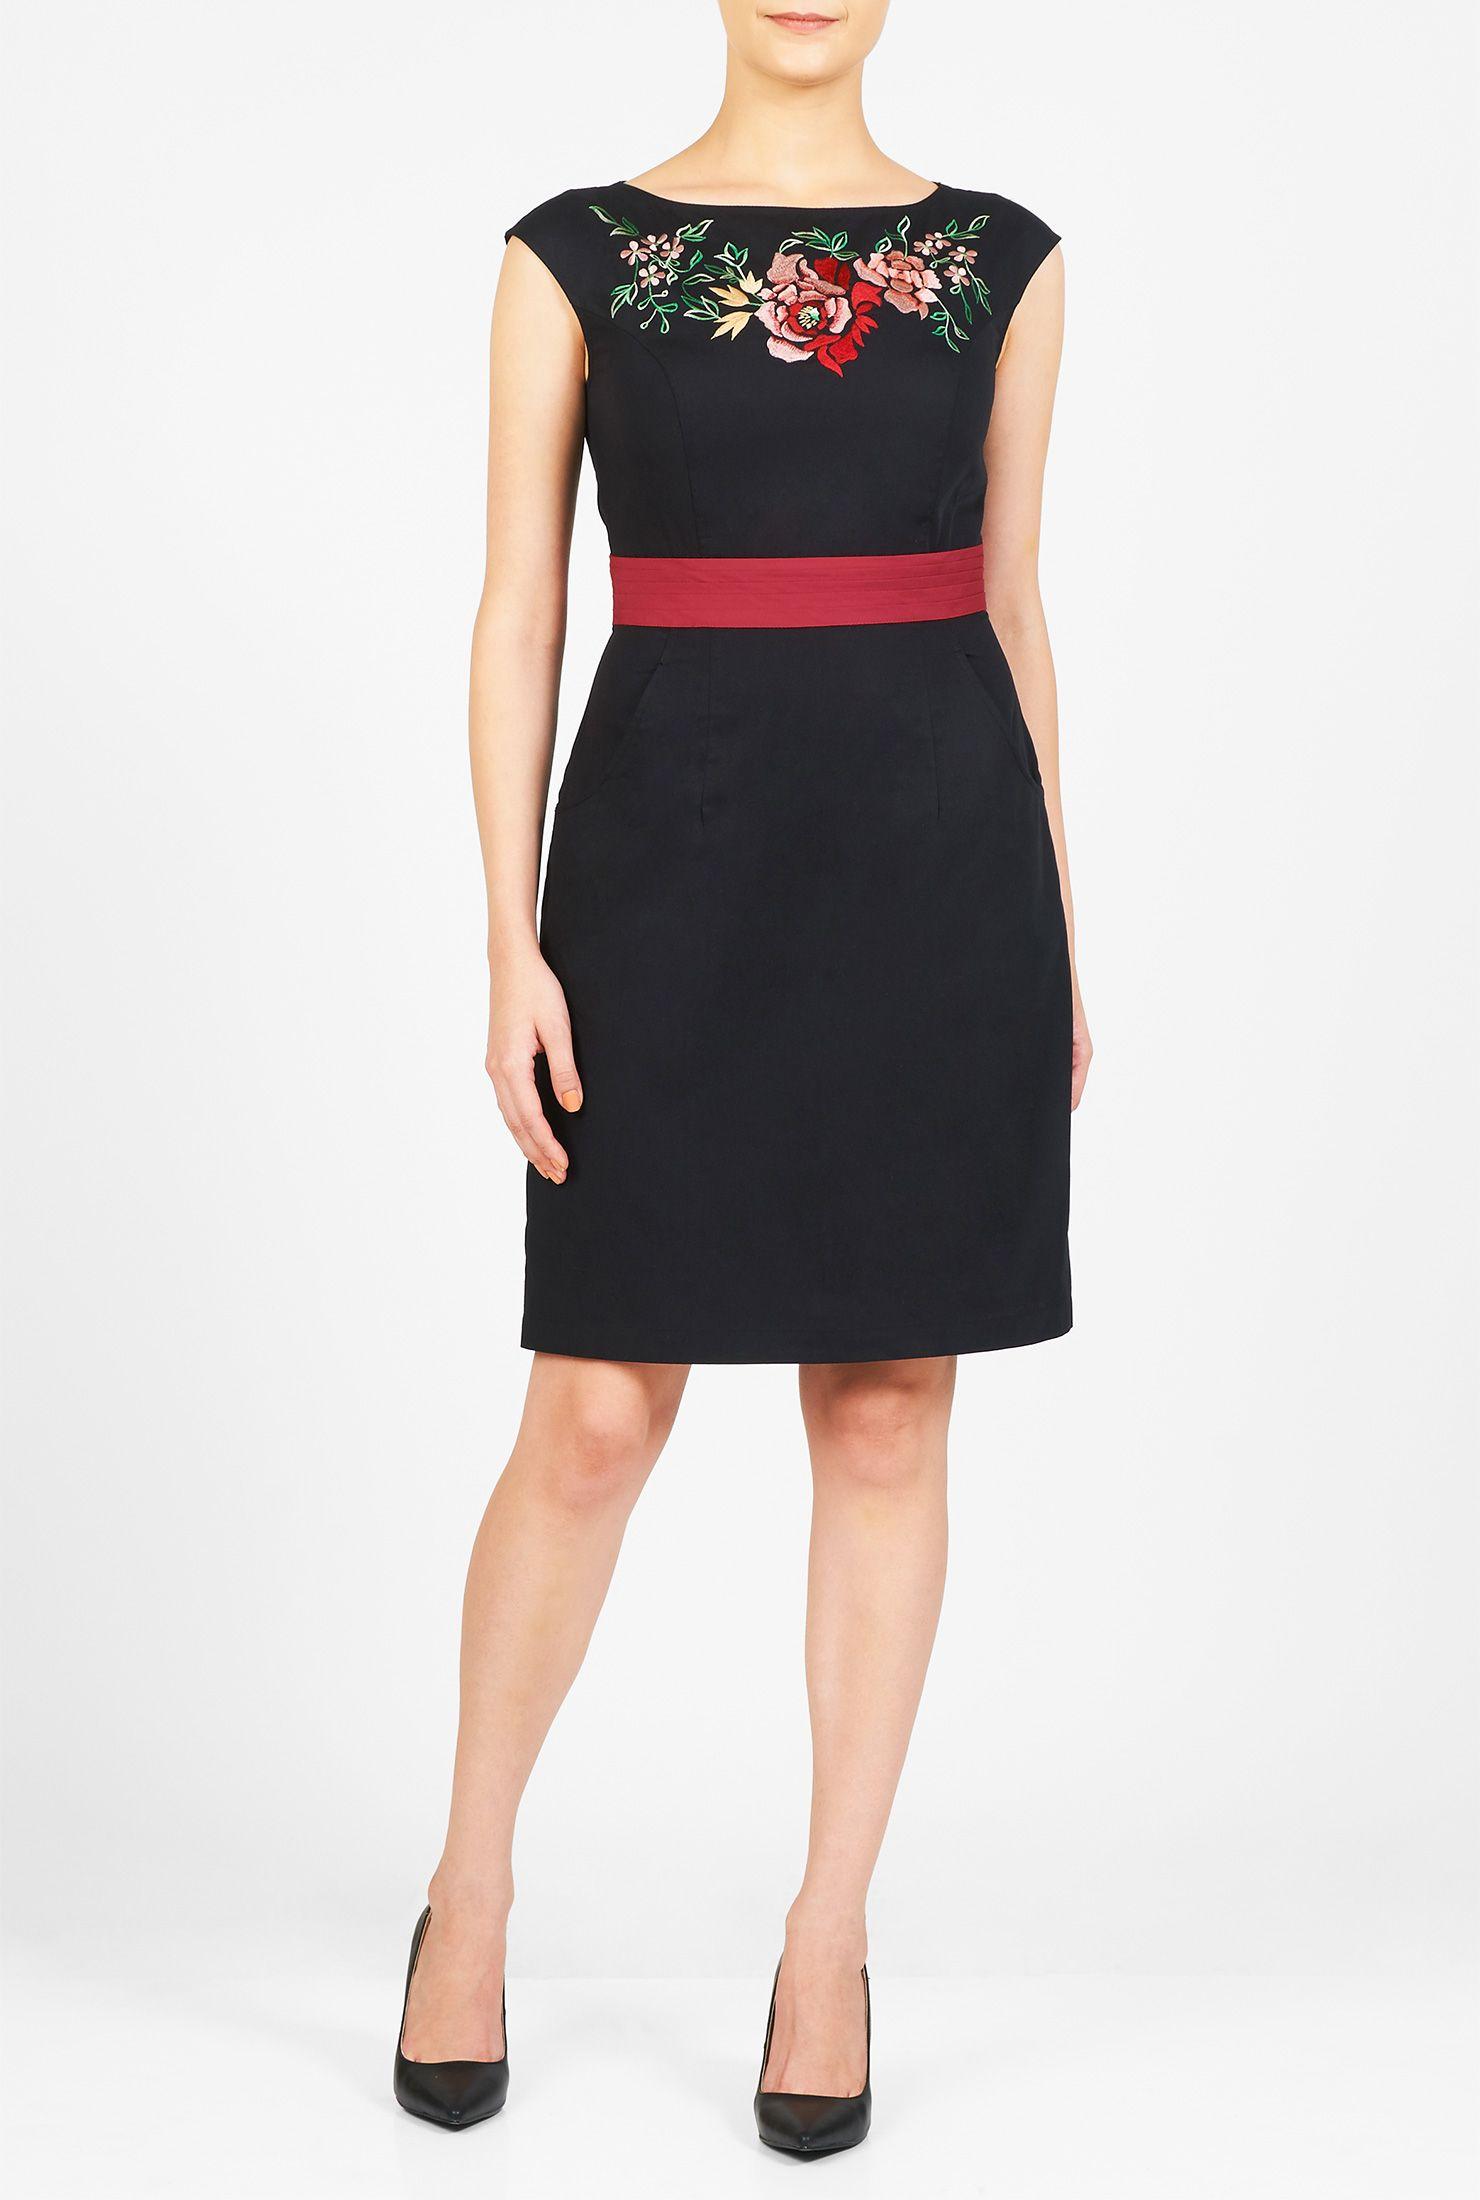 Above knee length dresses back zip dresses black and red dresses